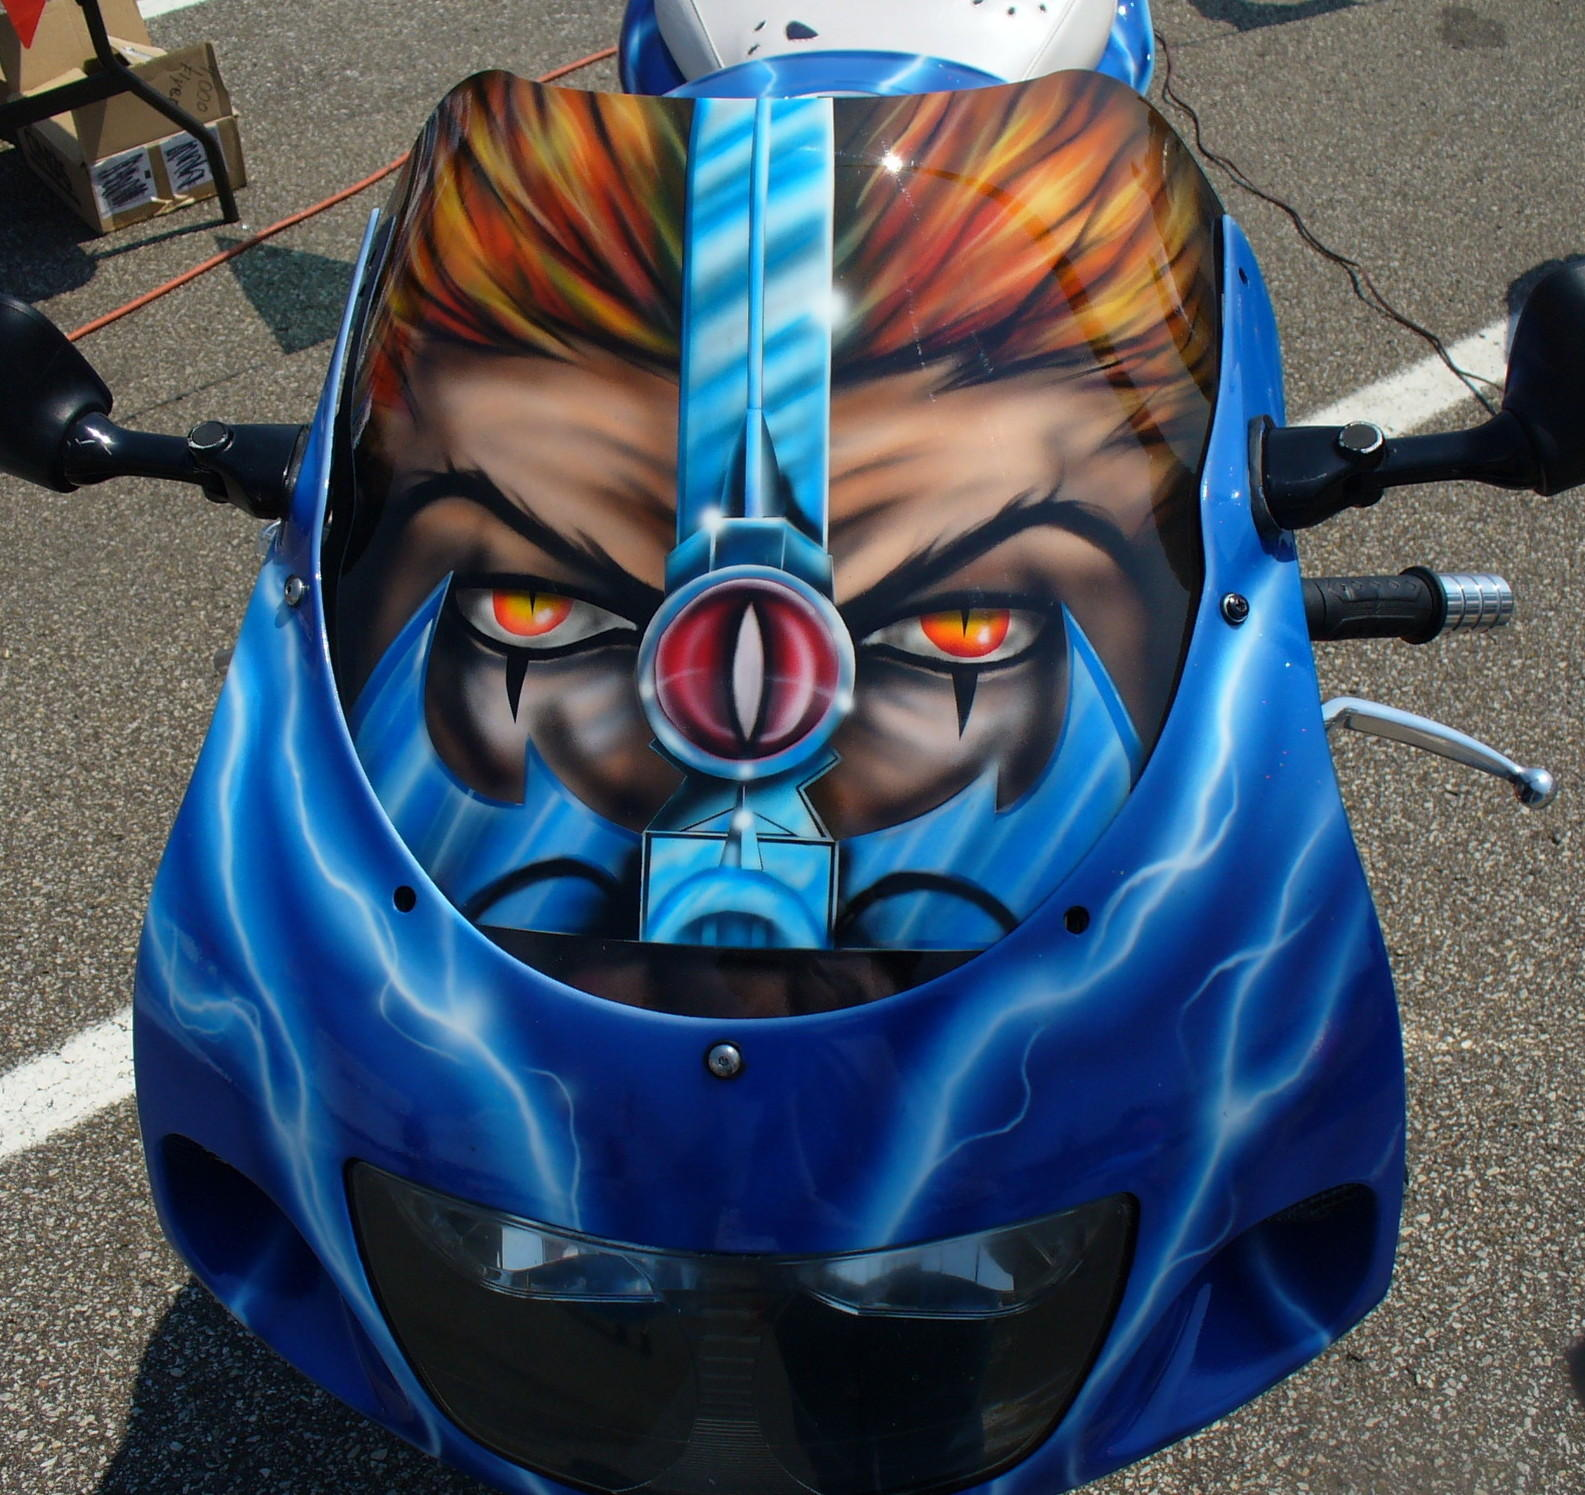 Thundercats Bike No.2